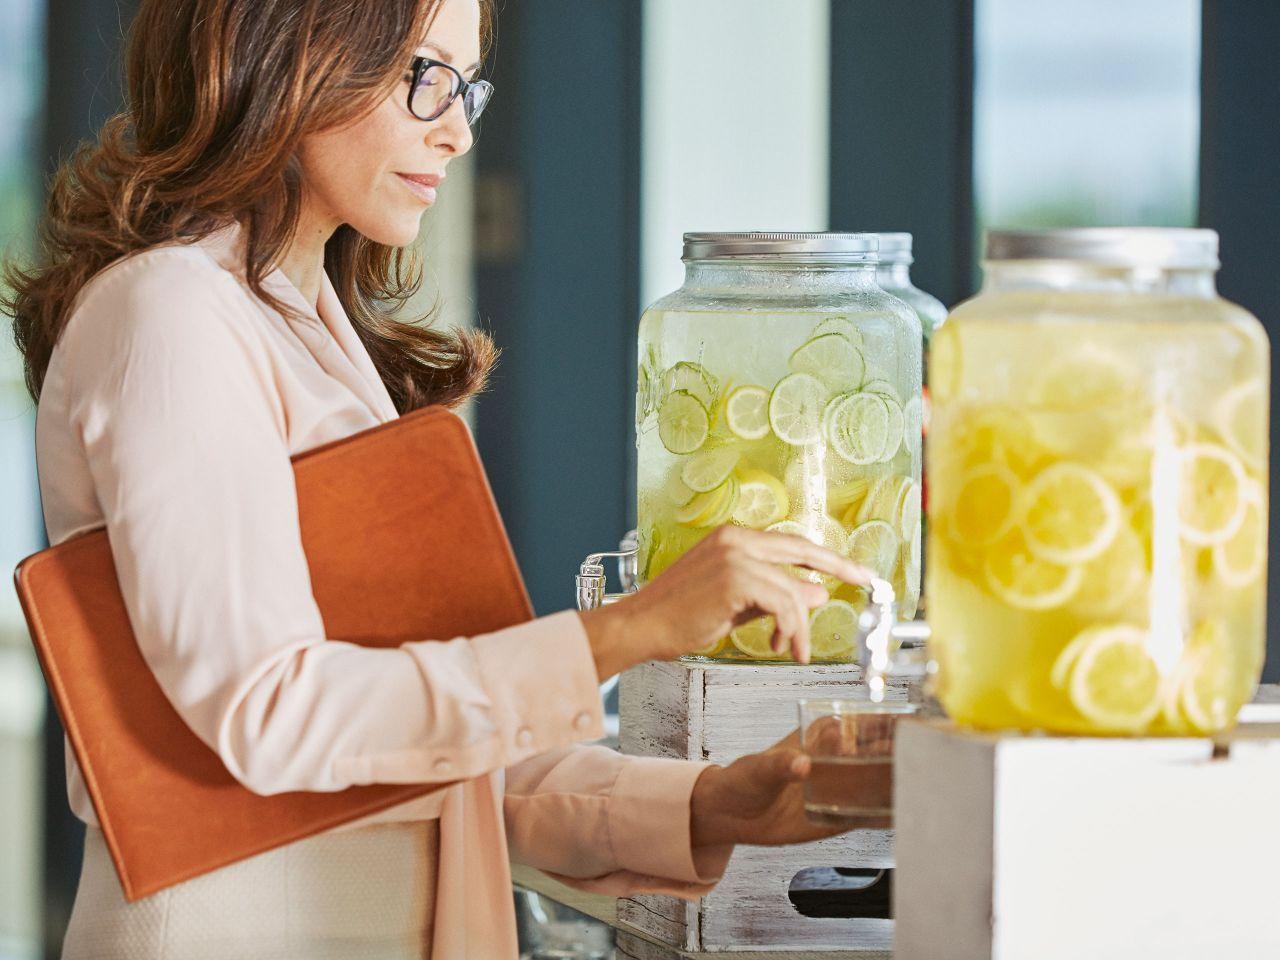 Business woman having lemon water